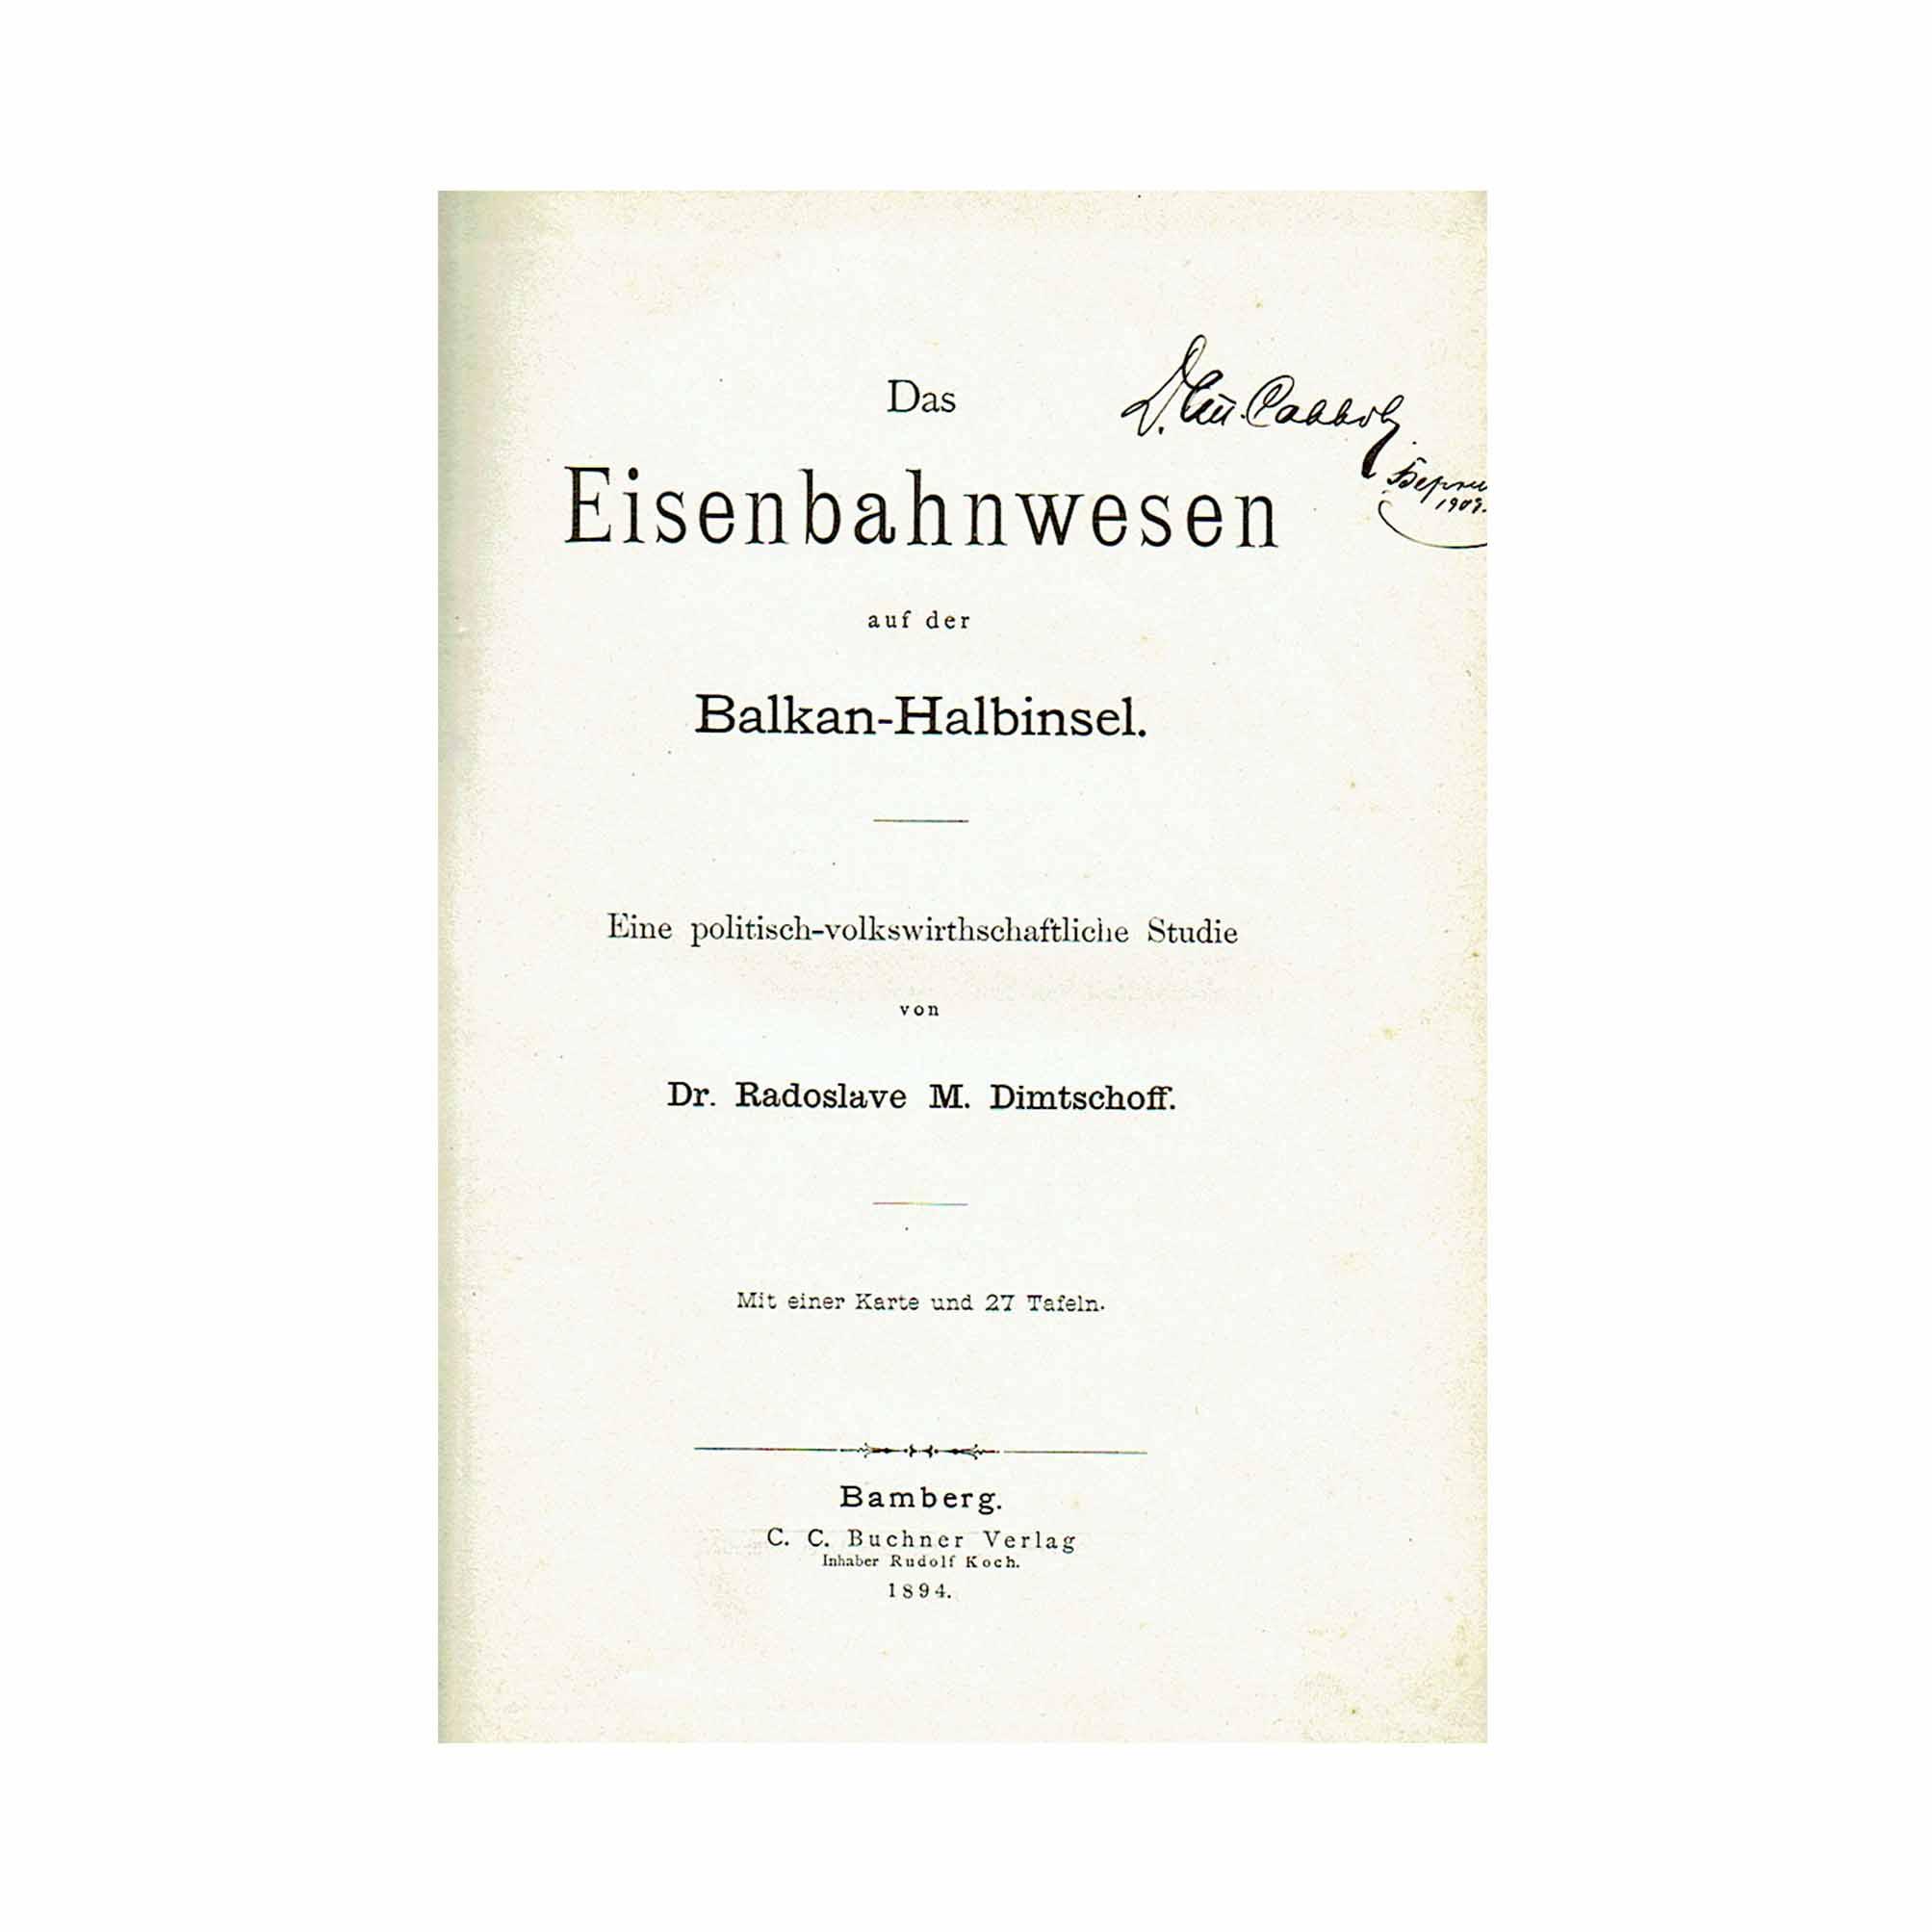 5807-Dimtschoff-Eisenbahn-Balkan-Titelblatt-A-N.jpg